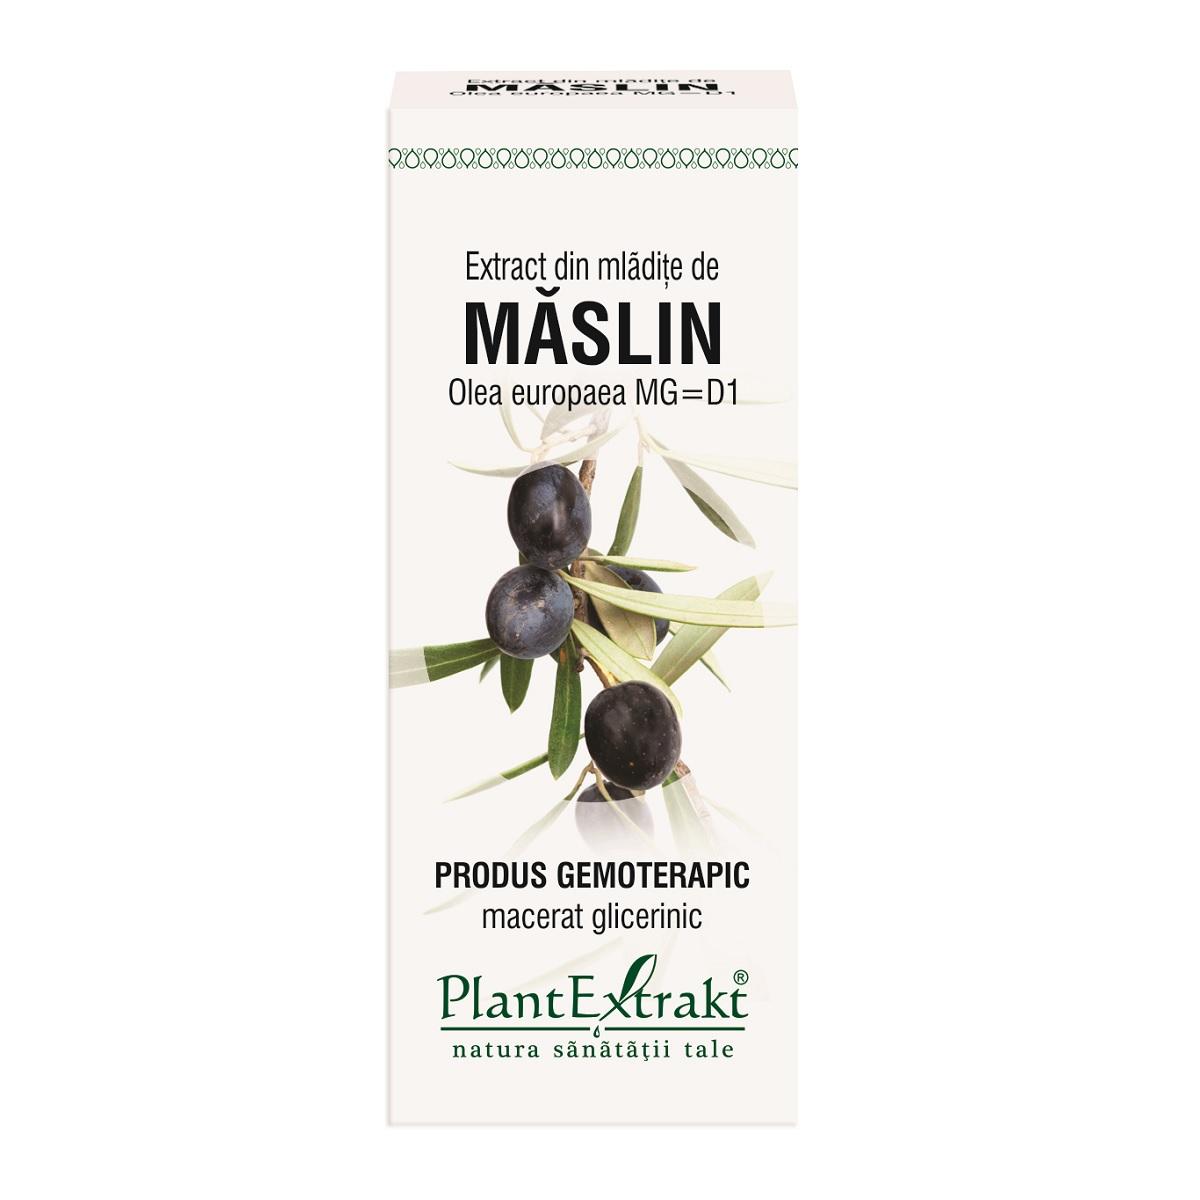 Extract din mladite de Maslin, 50ml, Plantextrakt imagine produs 2021